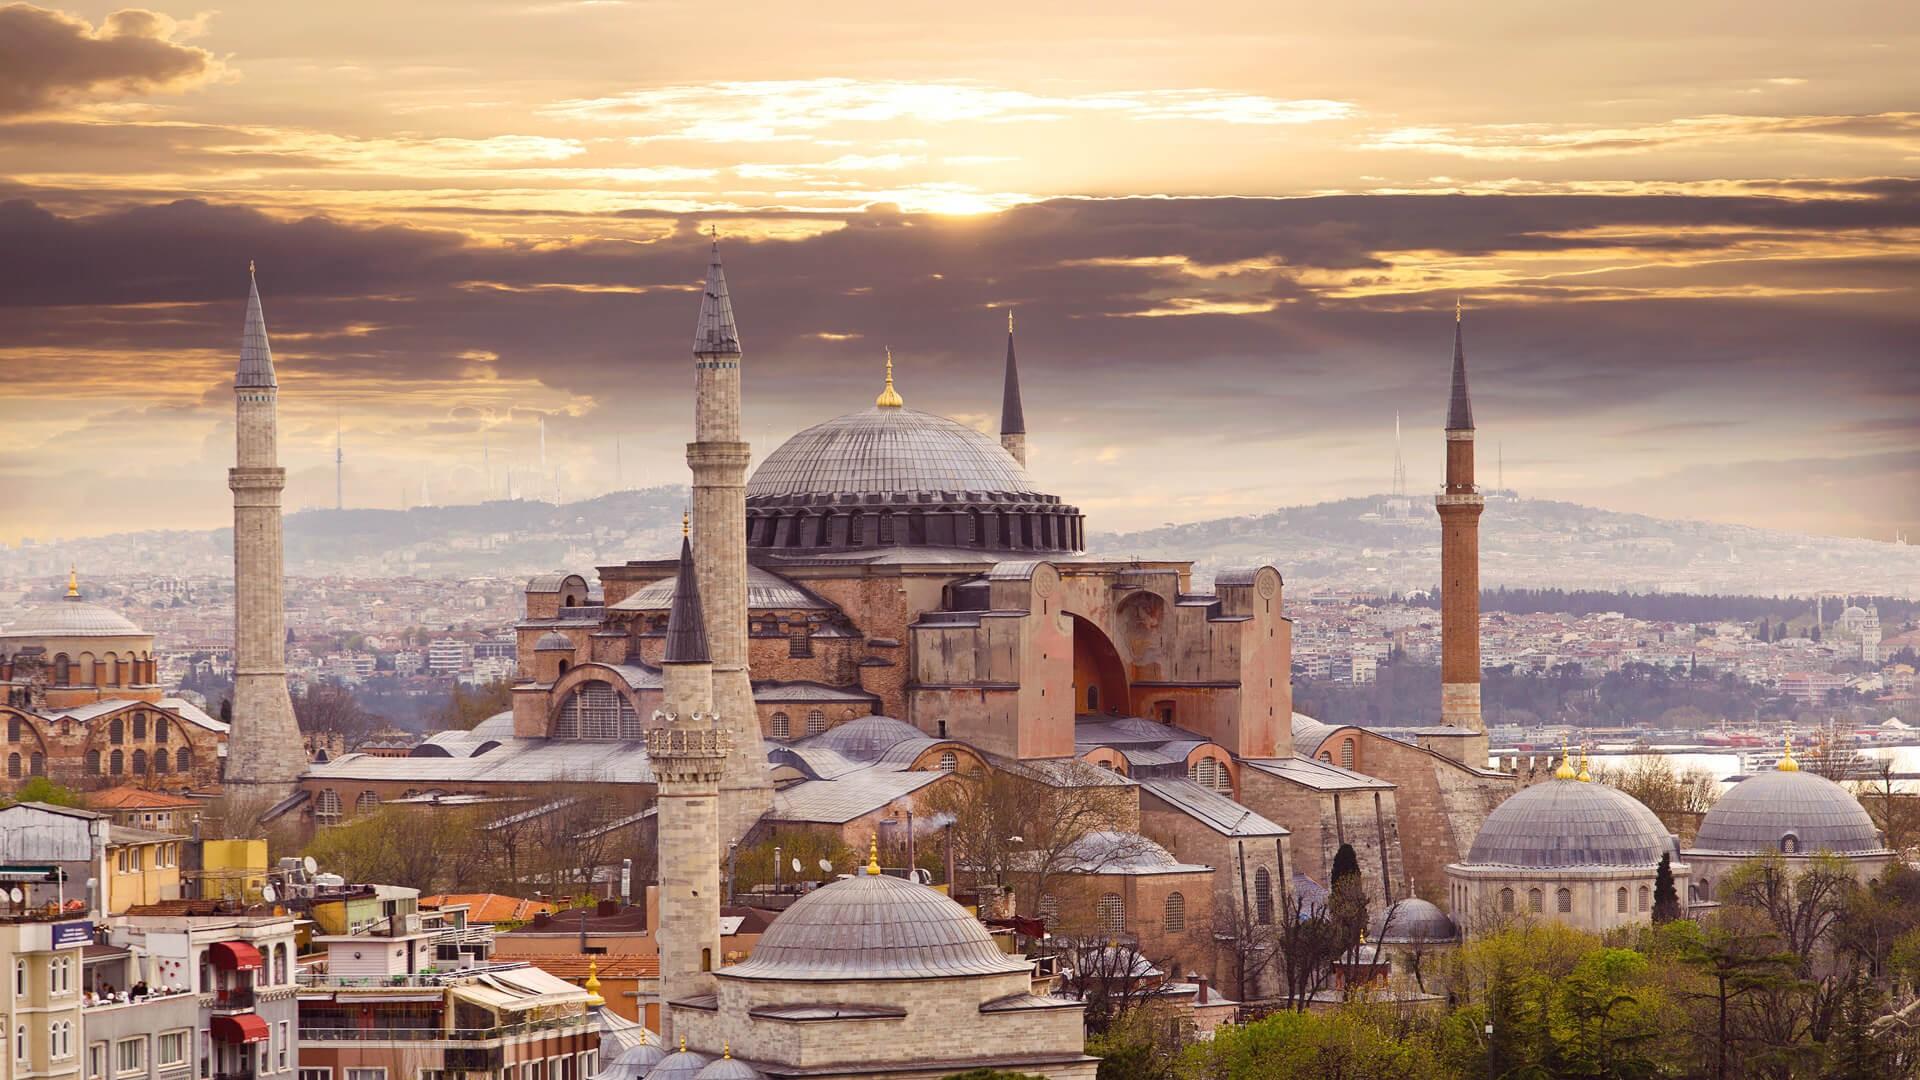 Wallpaper : Hagia Sophia, city, Istanbul, Turkey, architecture 1920x1080